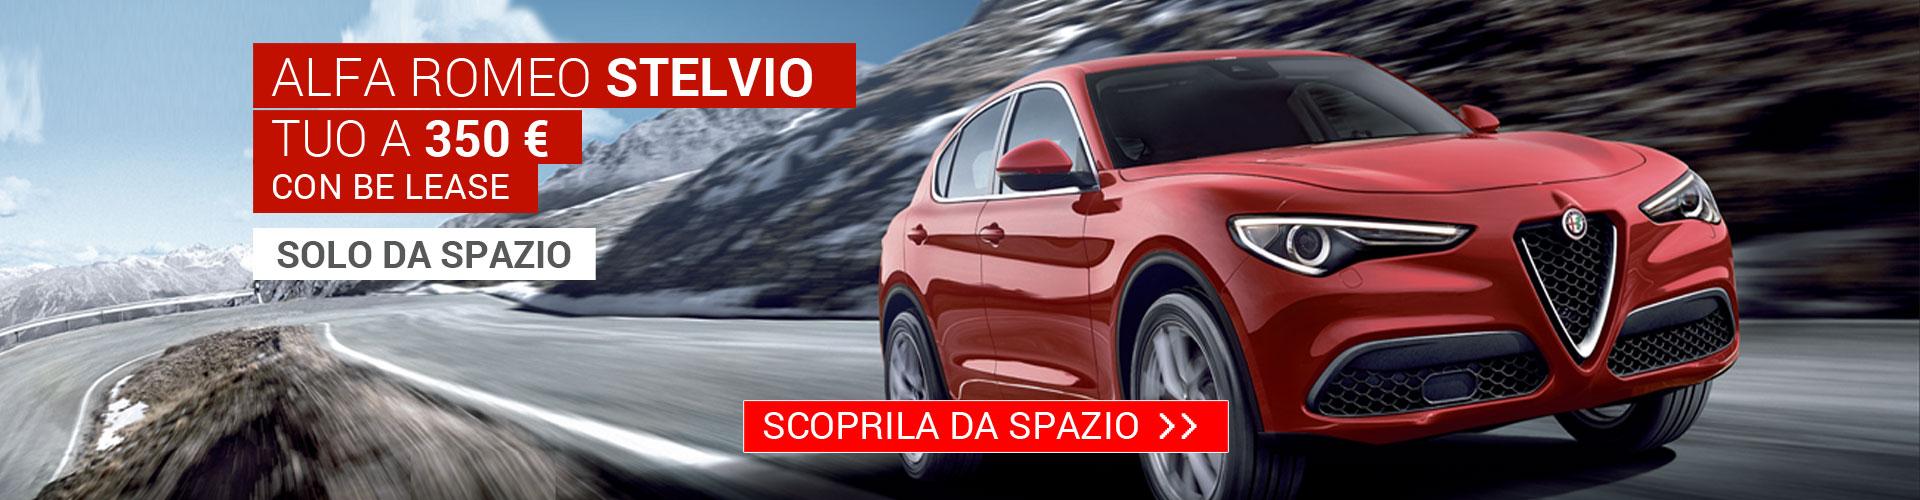 Alfa Romeo Stelvio da Spazio a Torino